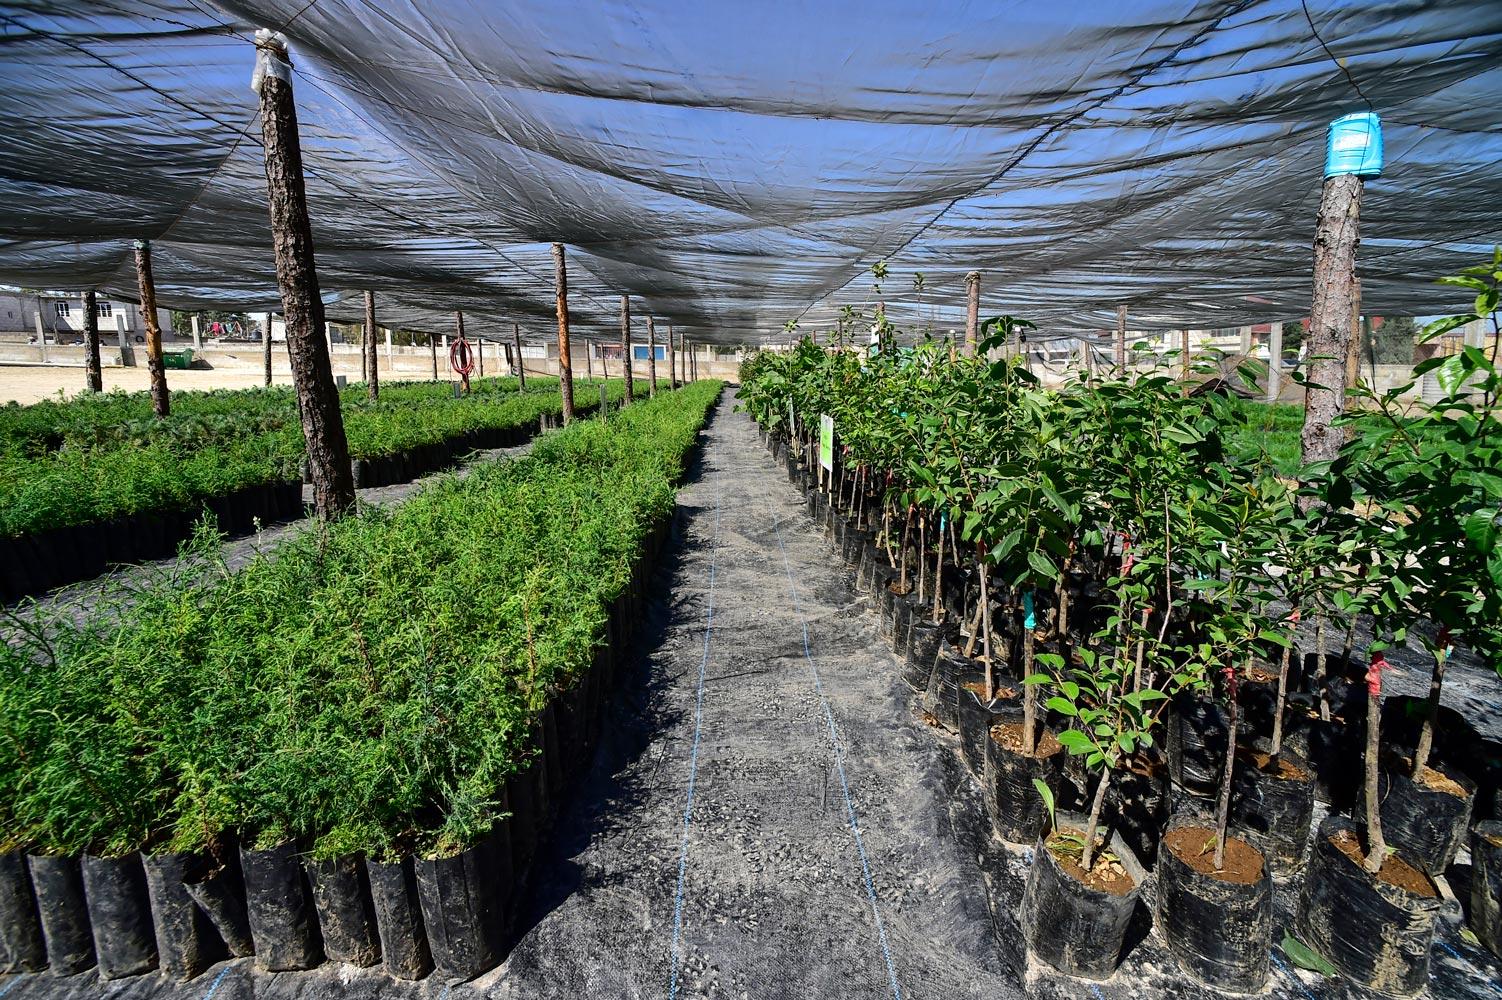 arboles-siembra-sembrando-vida-veracruz